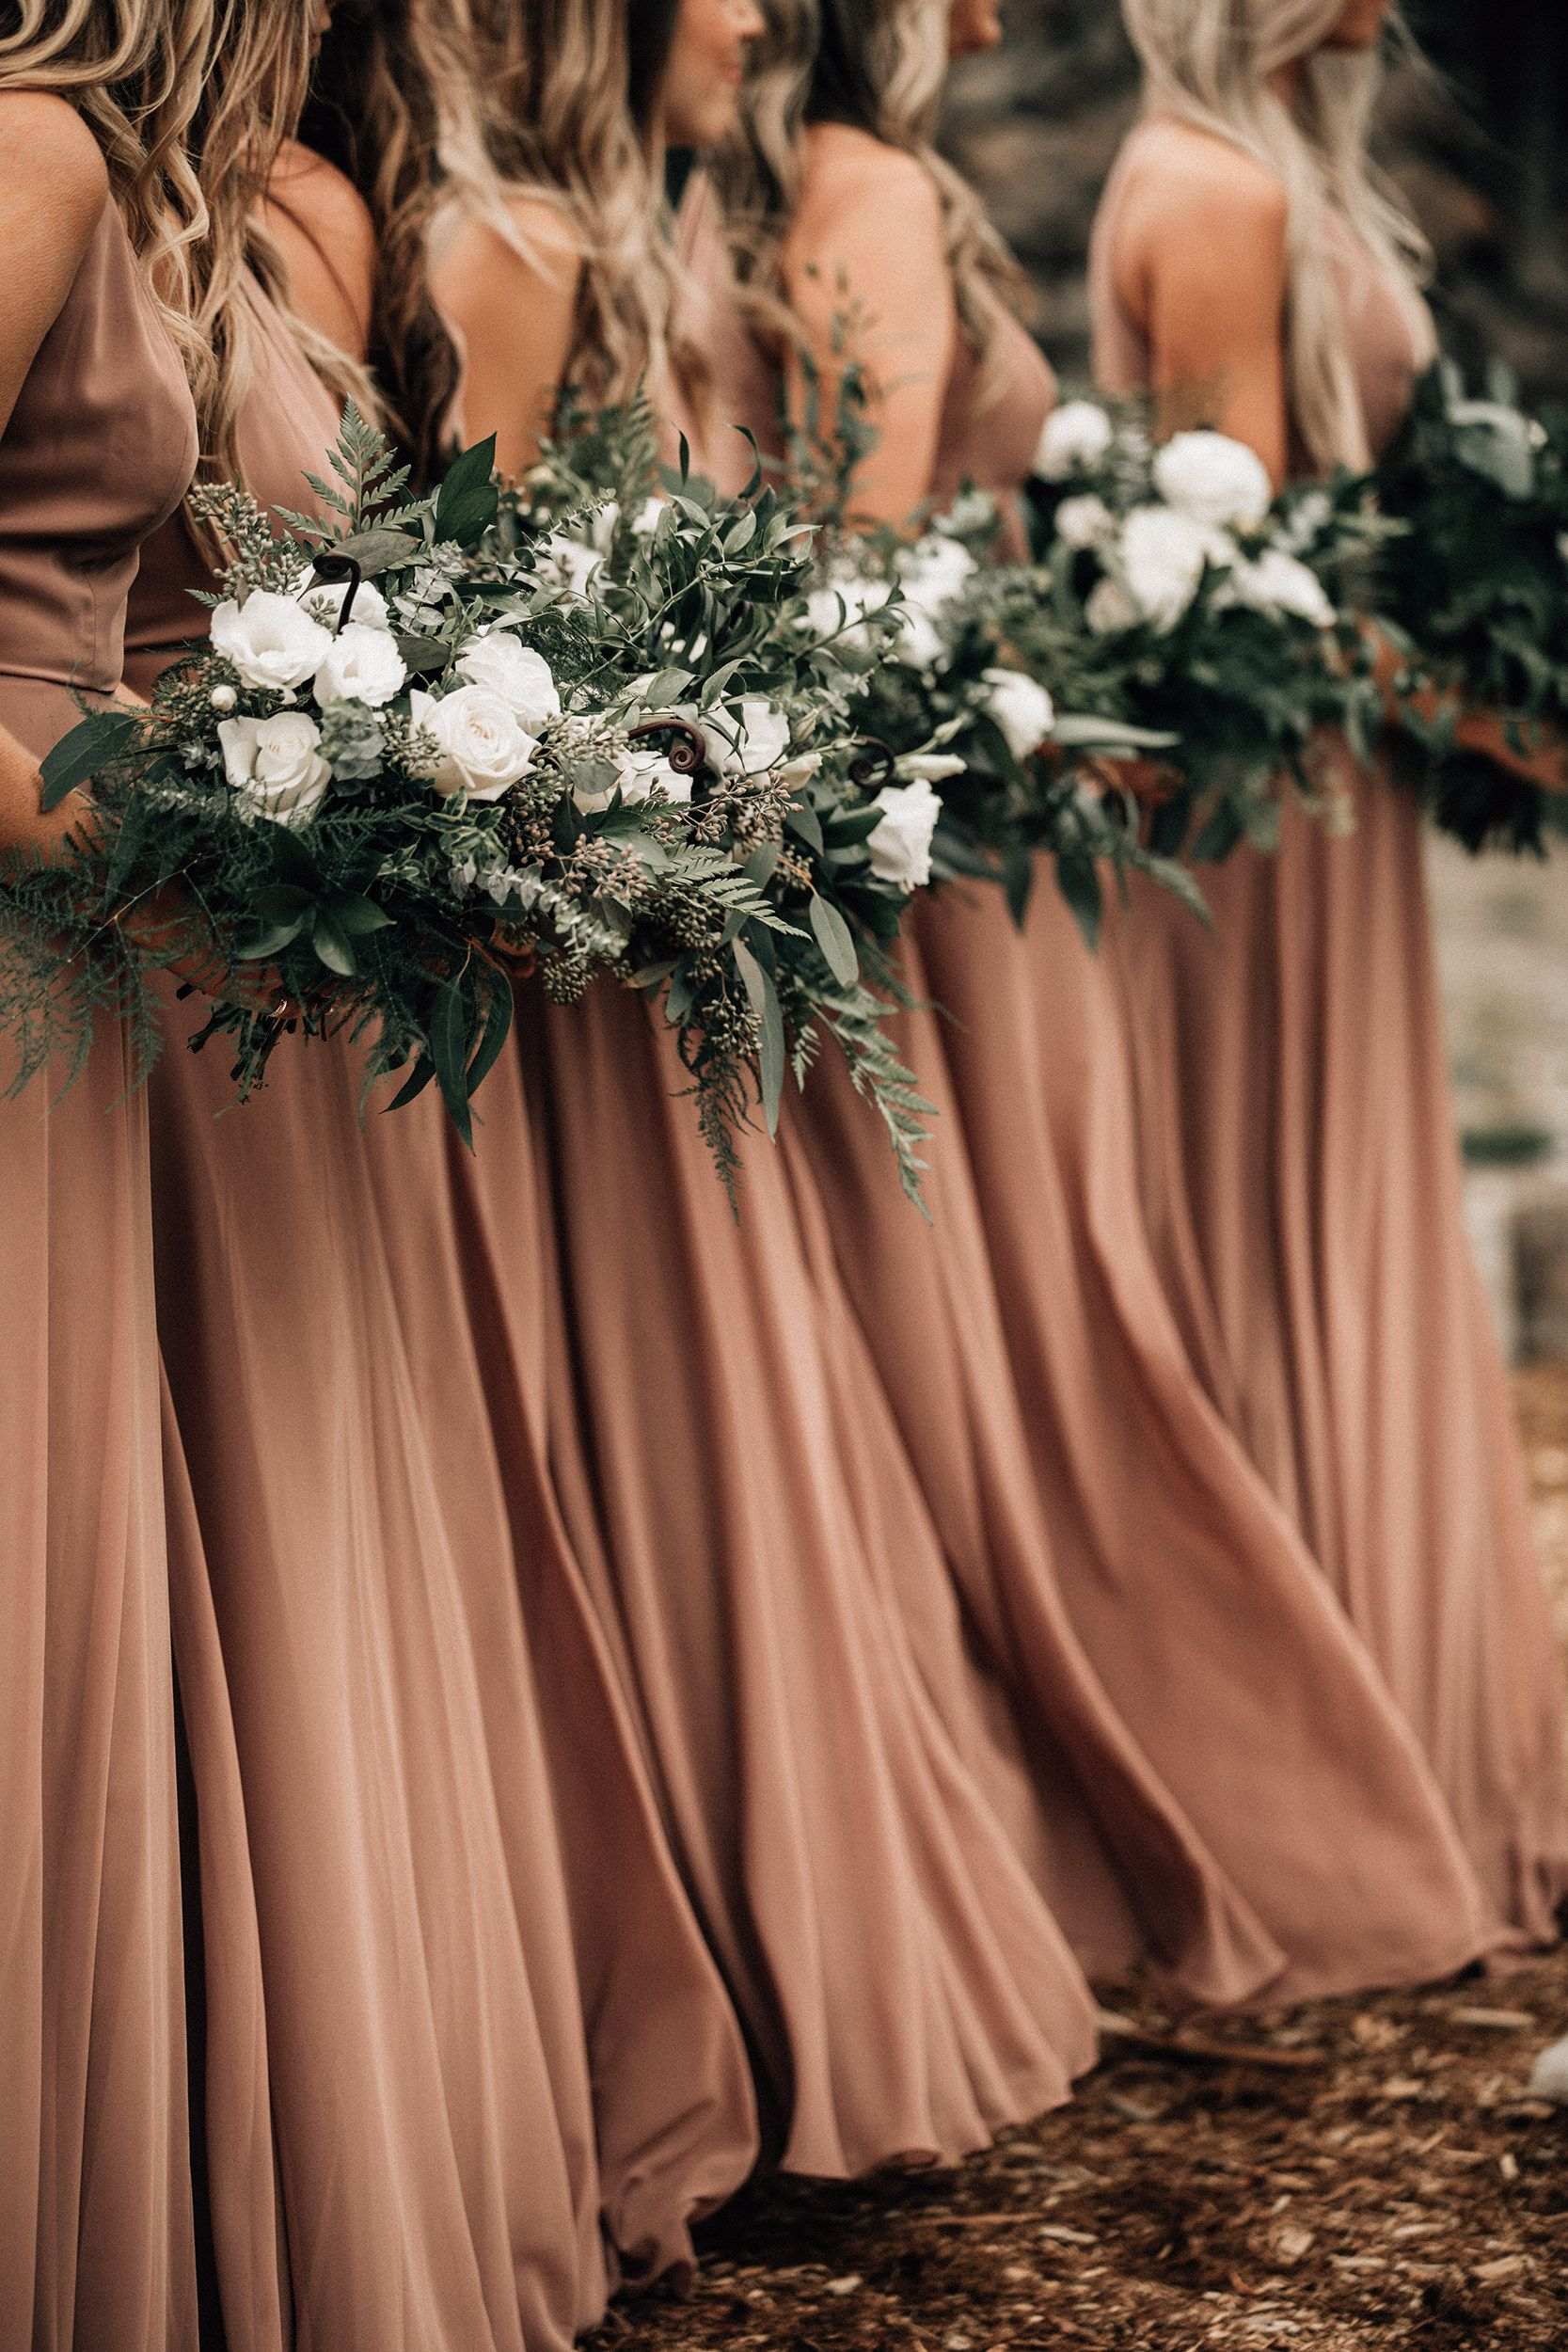 Taupe Bridesmaid Dresses Mountain Wedding Heavy Greenery Wedding